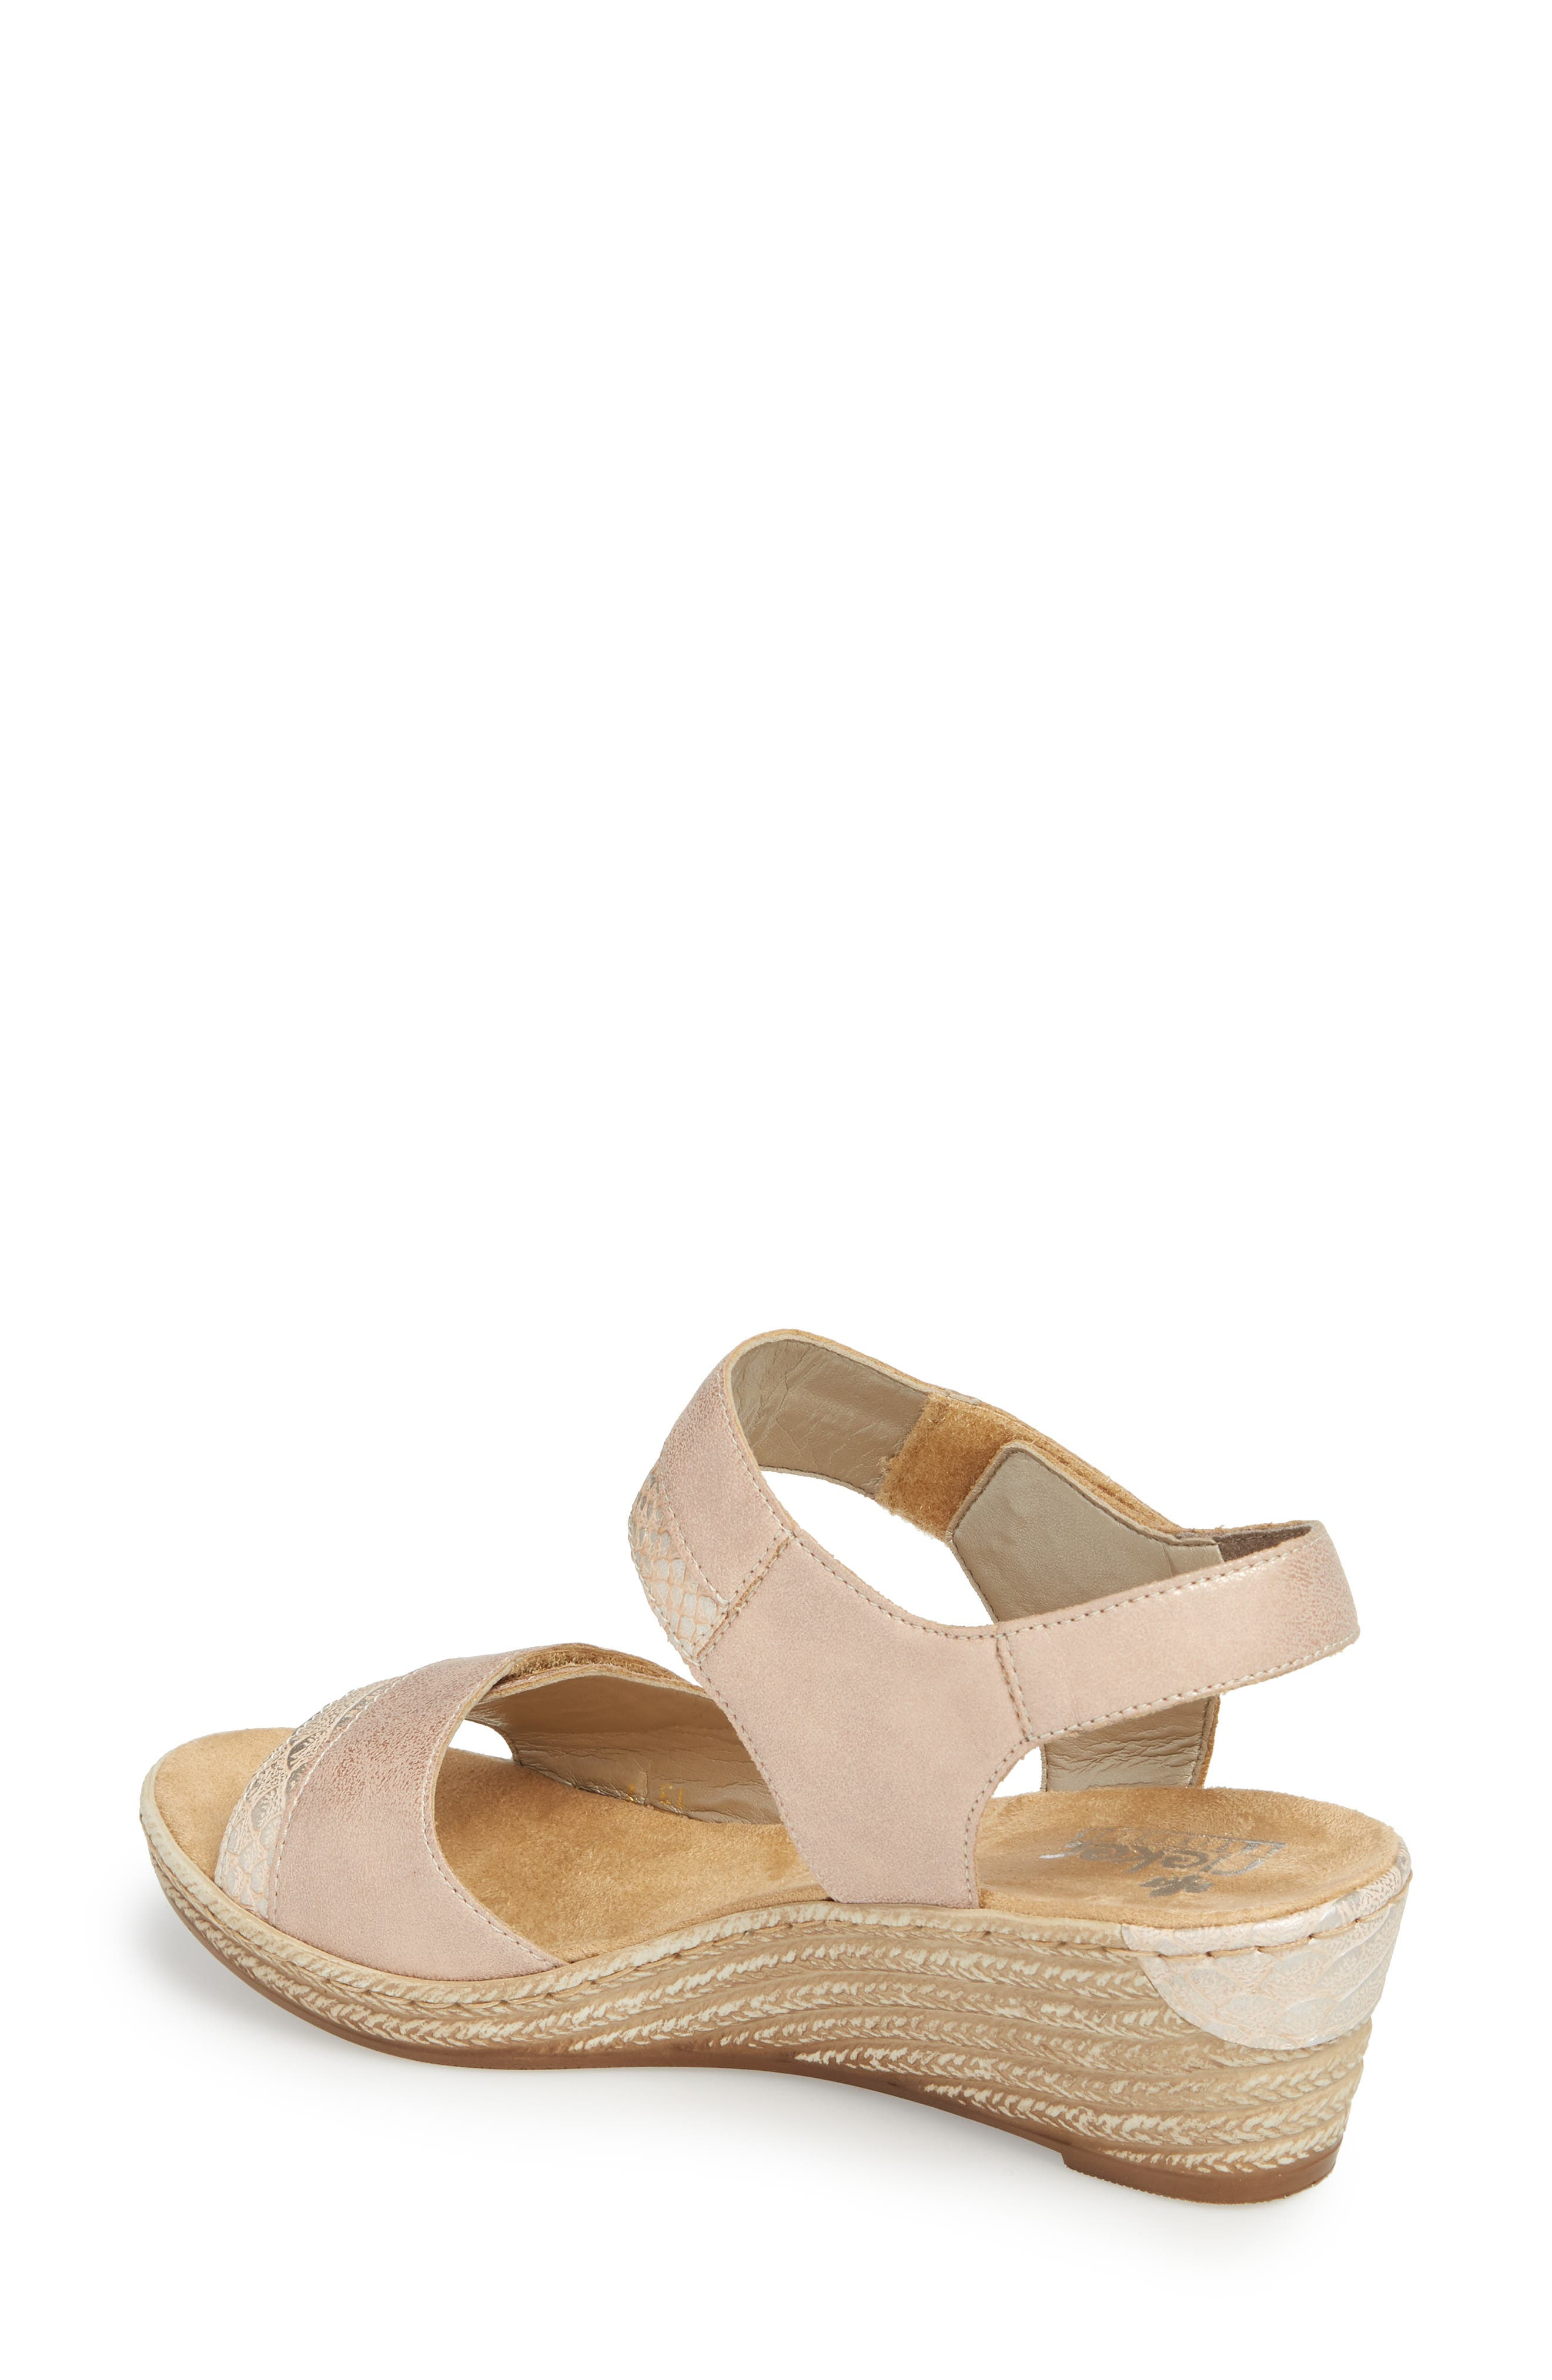 RIEKER ANTISTRESS,                             Fanni 70 Wedge Sandal,                             Alternate thumbnail 2, color,                             ROSE/ GINGER